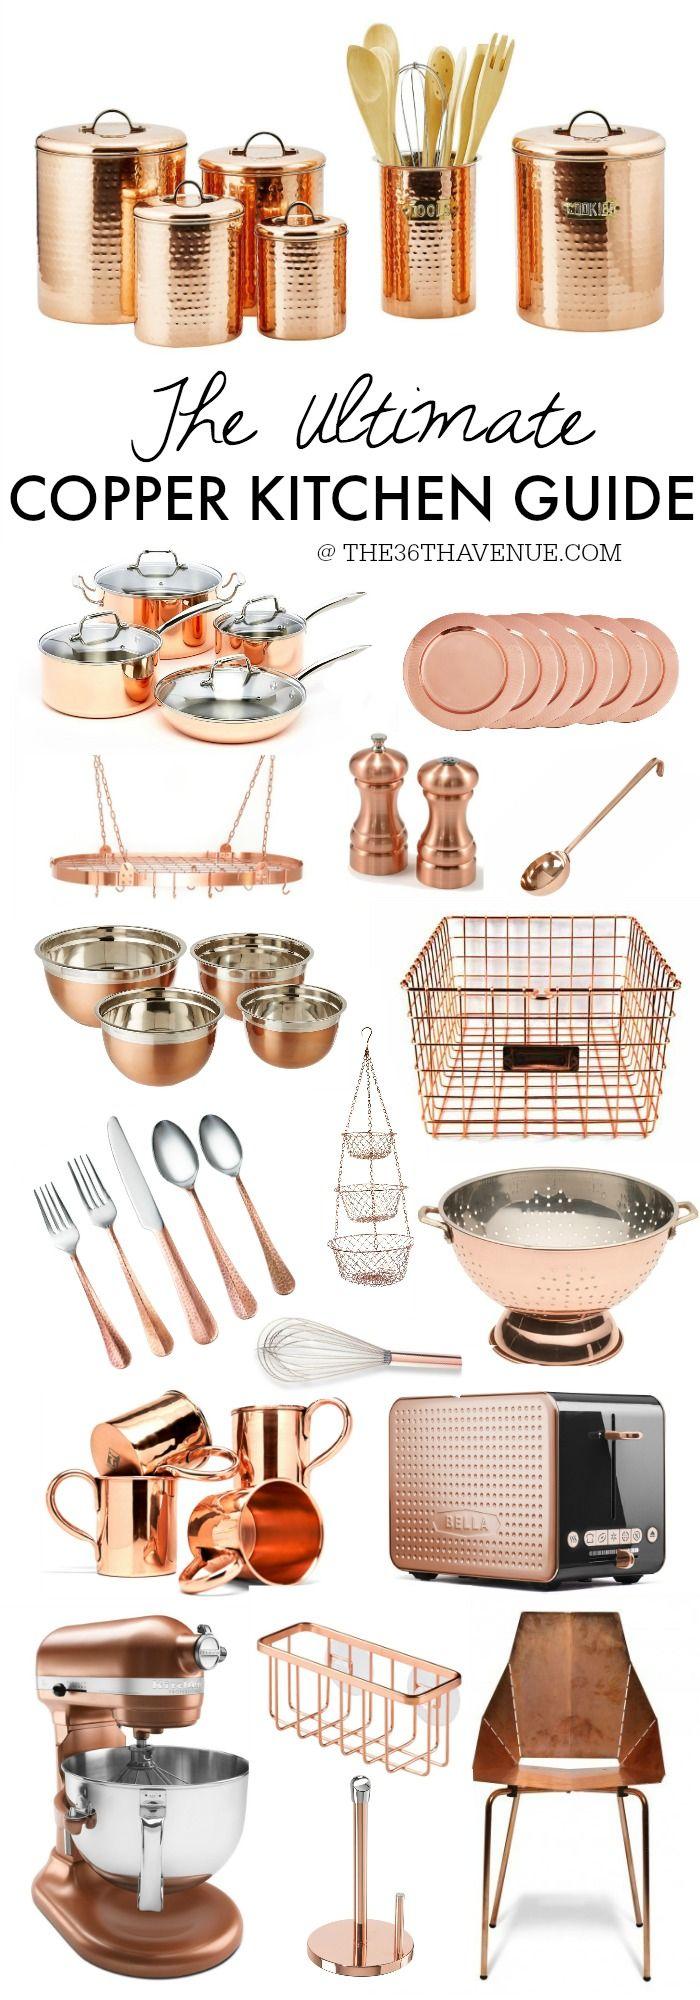 MUST SEE Cooper Kitchen Ideas!